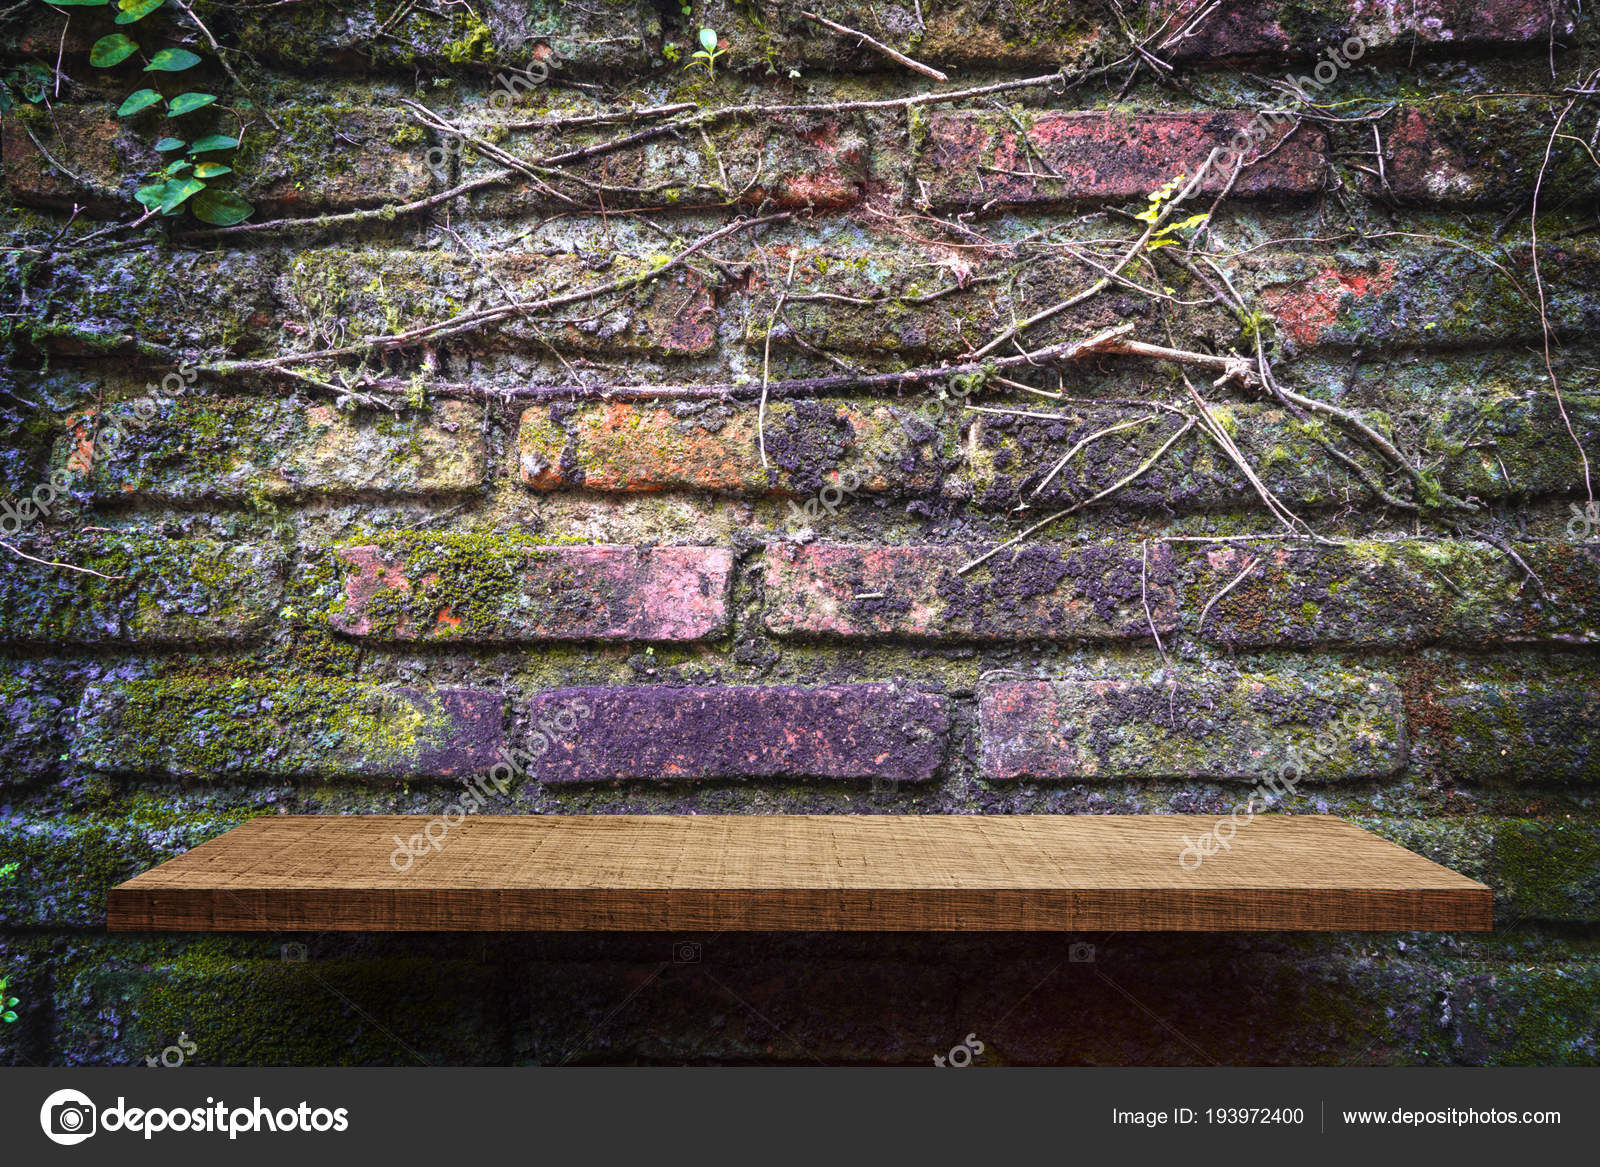 Bakstenen Muur Tuin : Lege schappen product display tuin bakstenen muur achtergrond